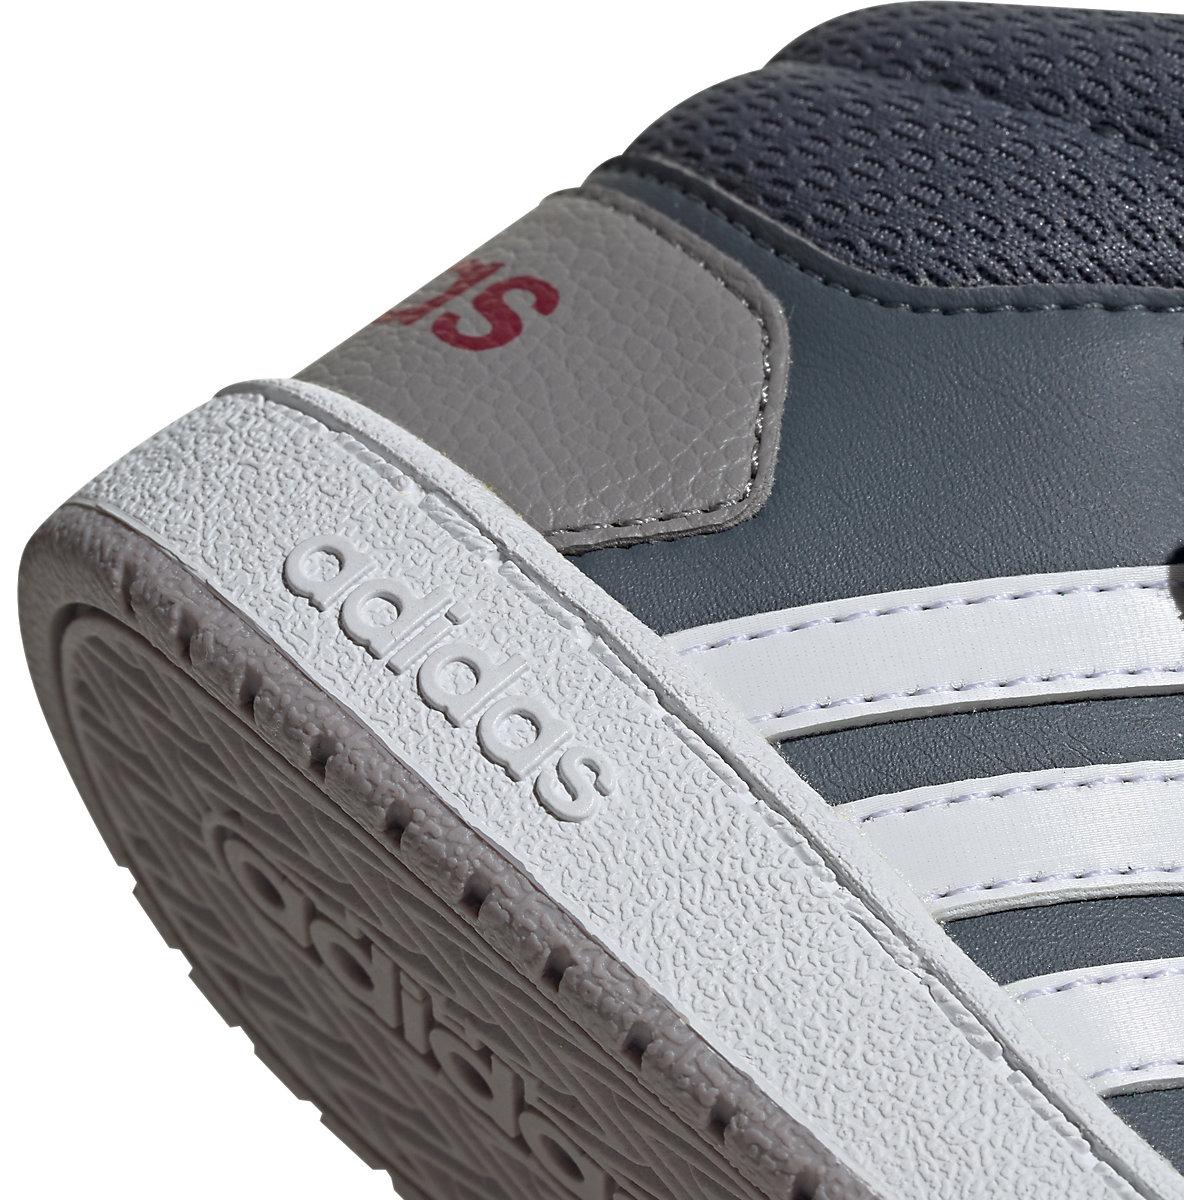 Adidas Sport Inspired, Baby Sneakers High Hoops Mid 2.0 I Für Jungen, Grau/anthrazit